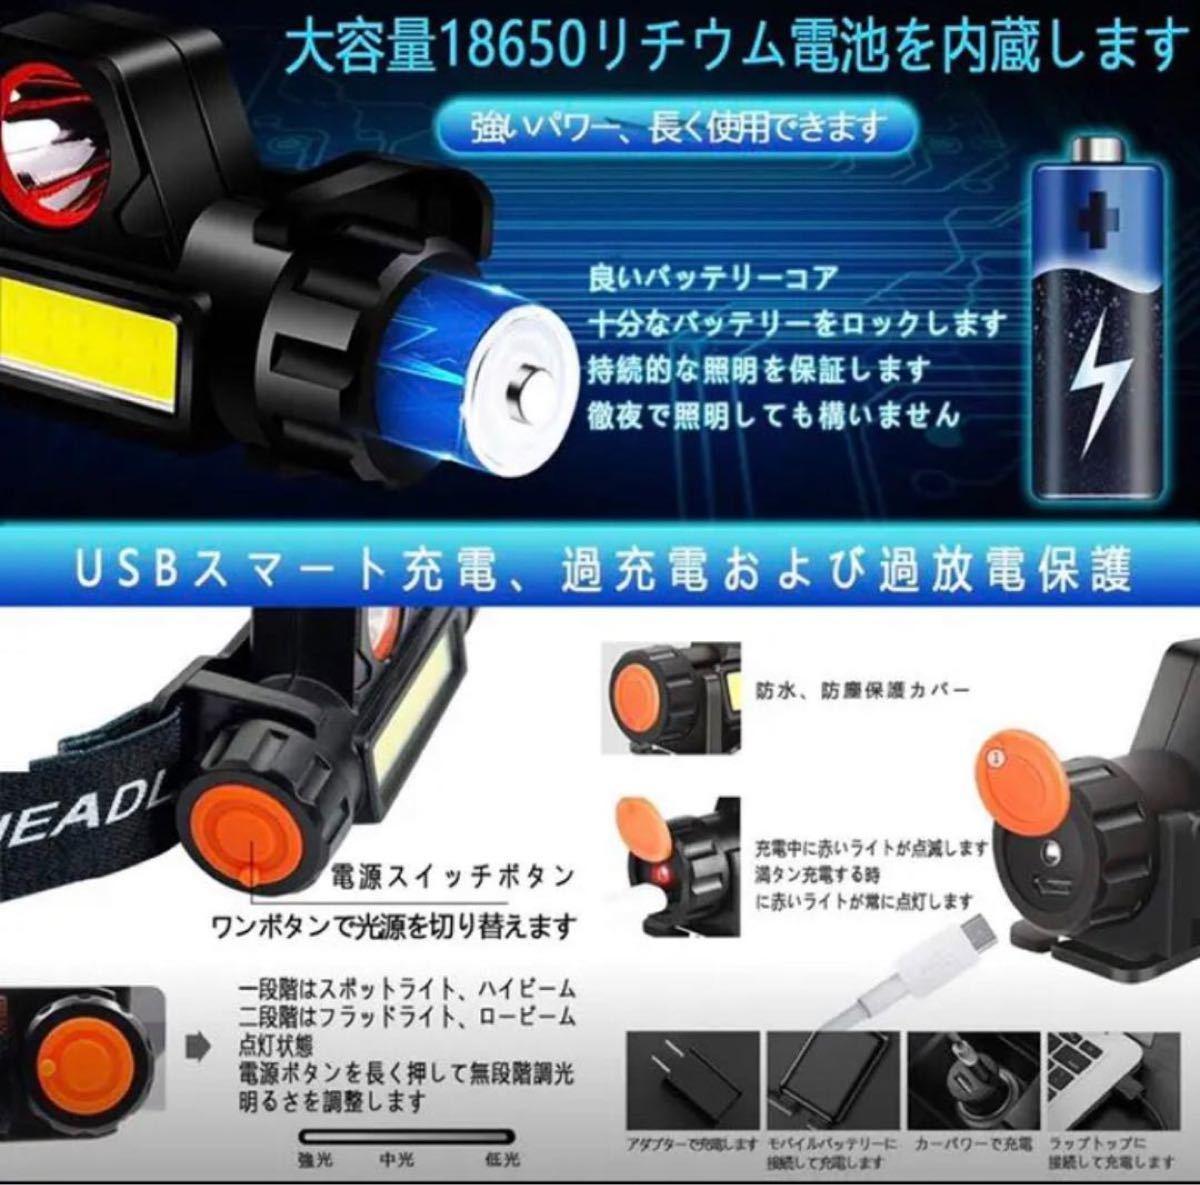 LEDヘッドライト USB充電式 90°回転 キャンプ 夜釣り 登山